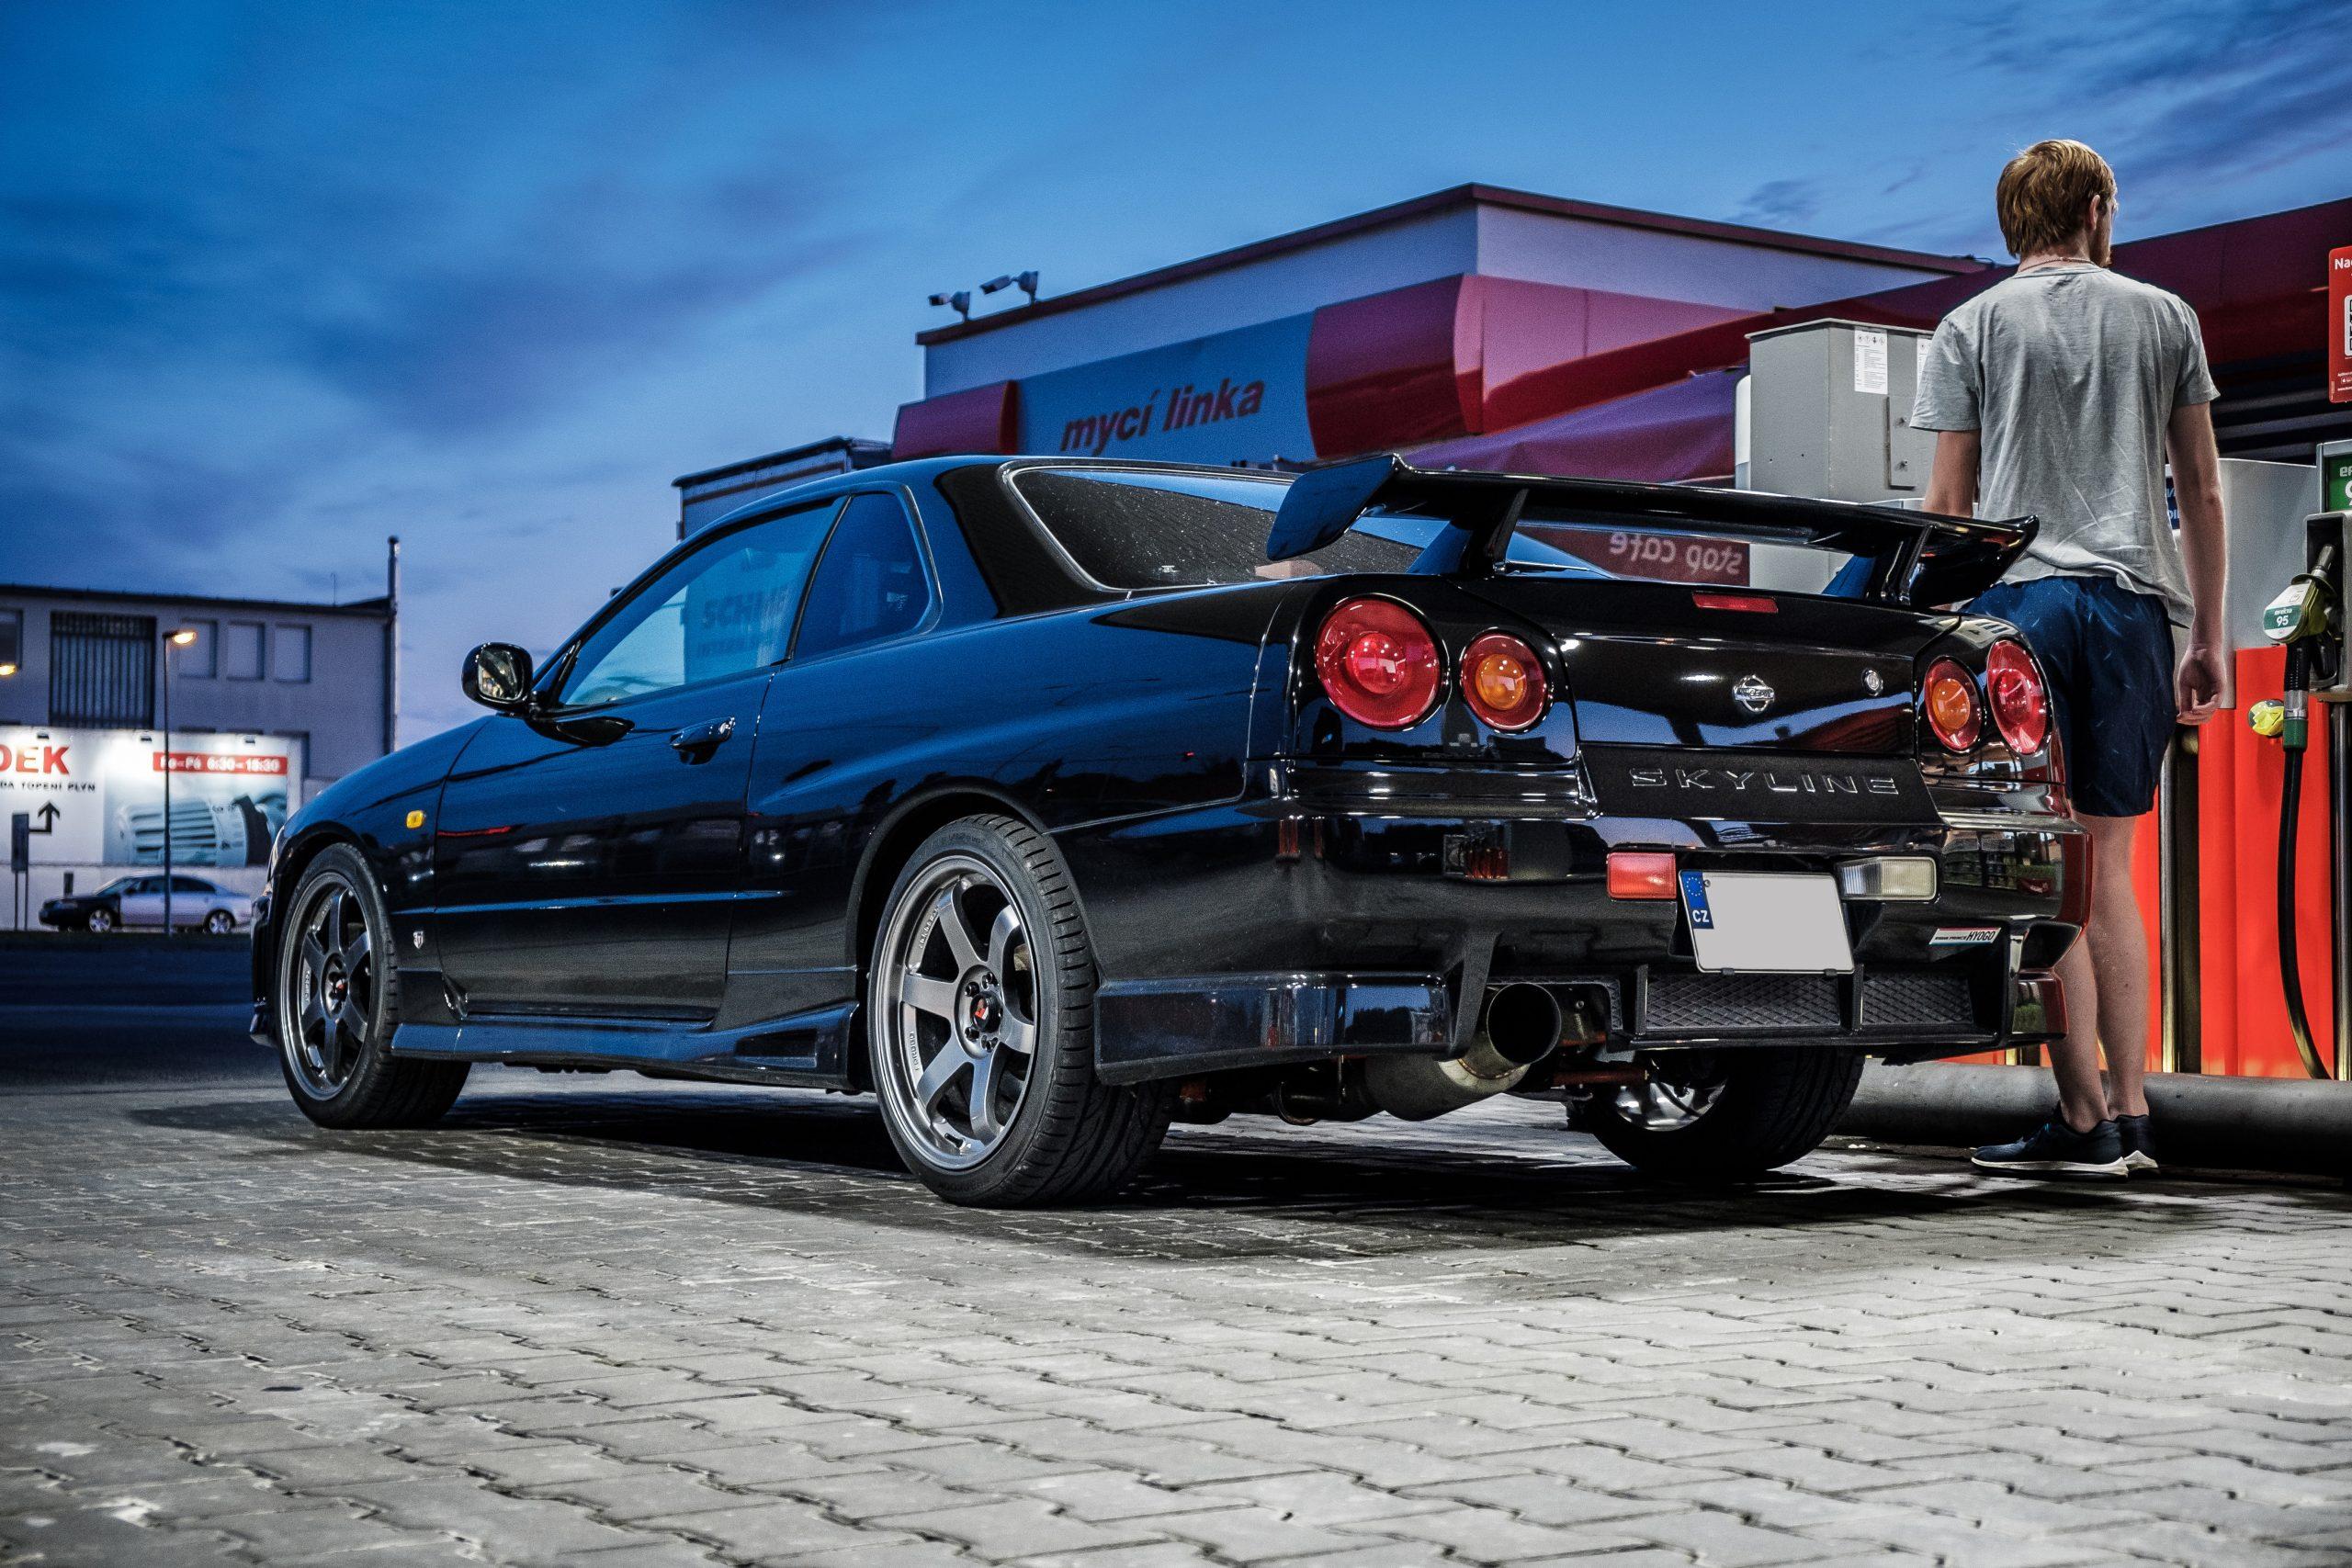 Nissan Skyline GT-R Tankstation